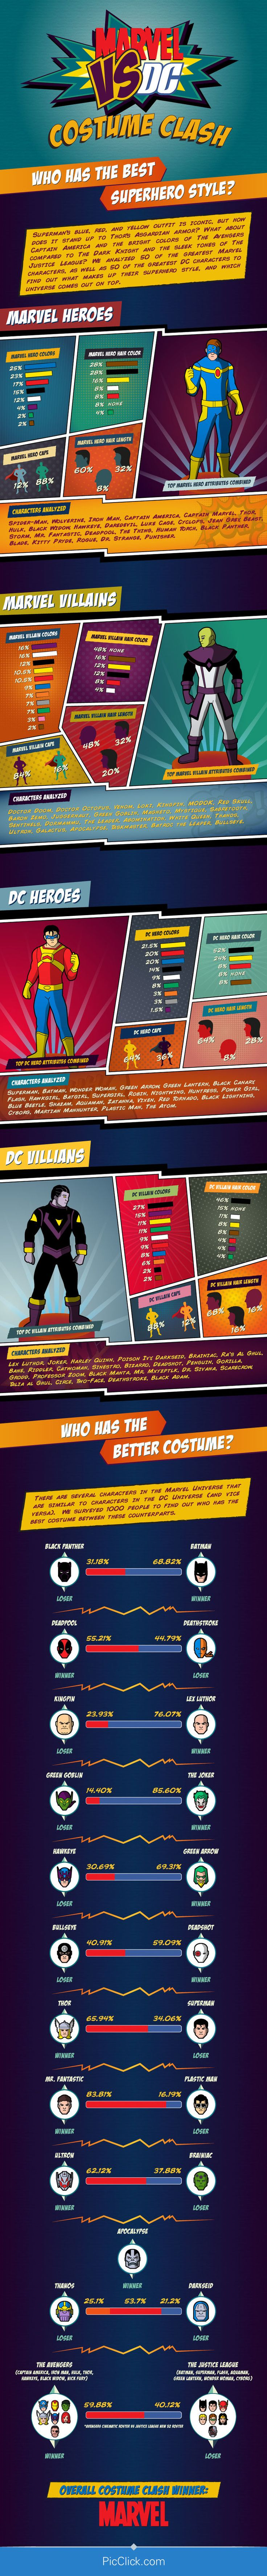 Marvel Vs. DC Costume Clash Infographic — GeekTyrant